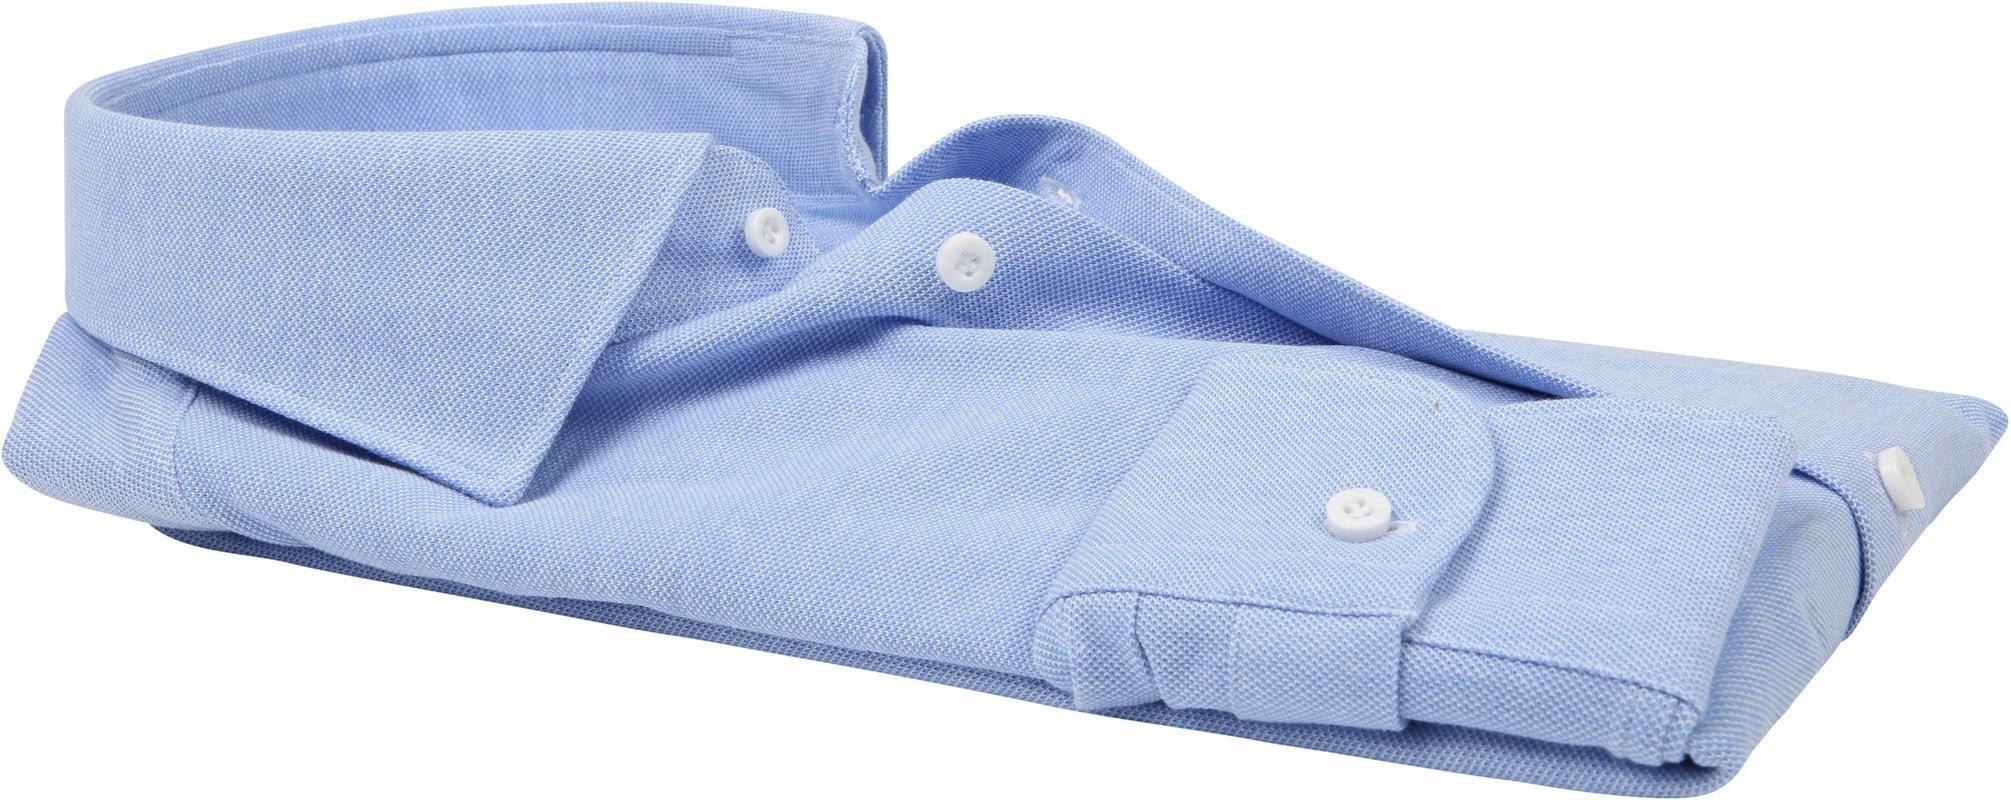 Profuomo Overhemd Knitted Blauw foto 3